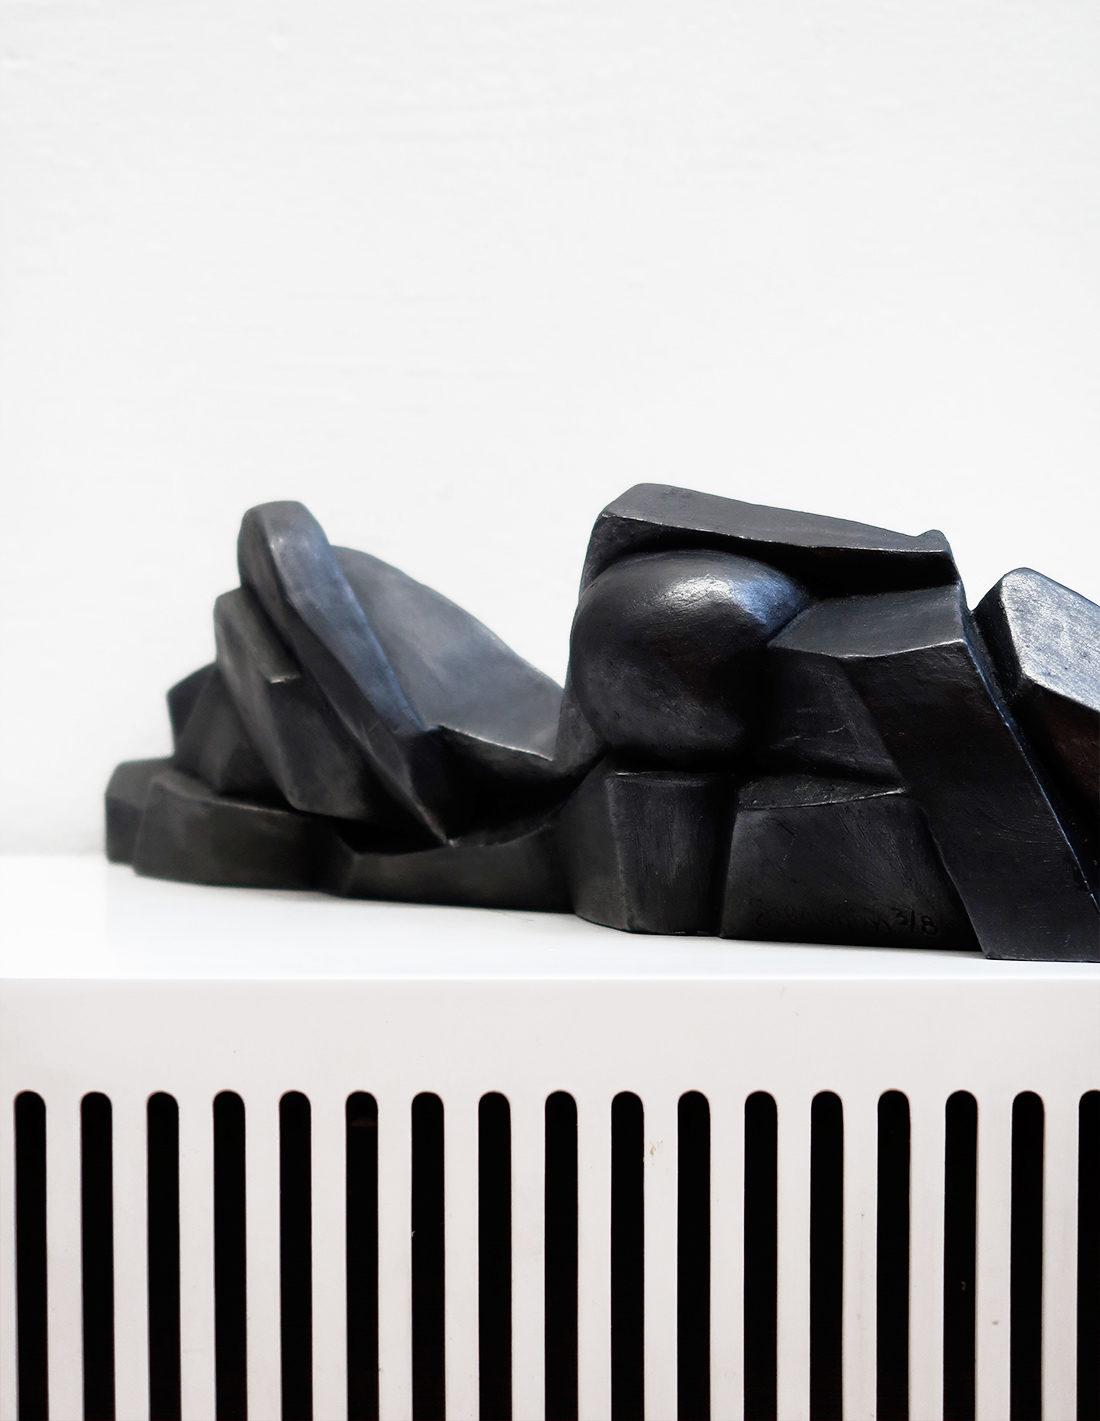 Patricia Zieseniss - Sculpture - Le Repos